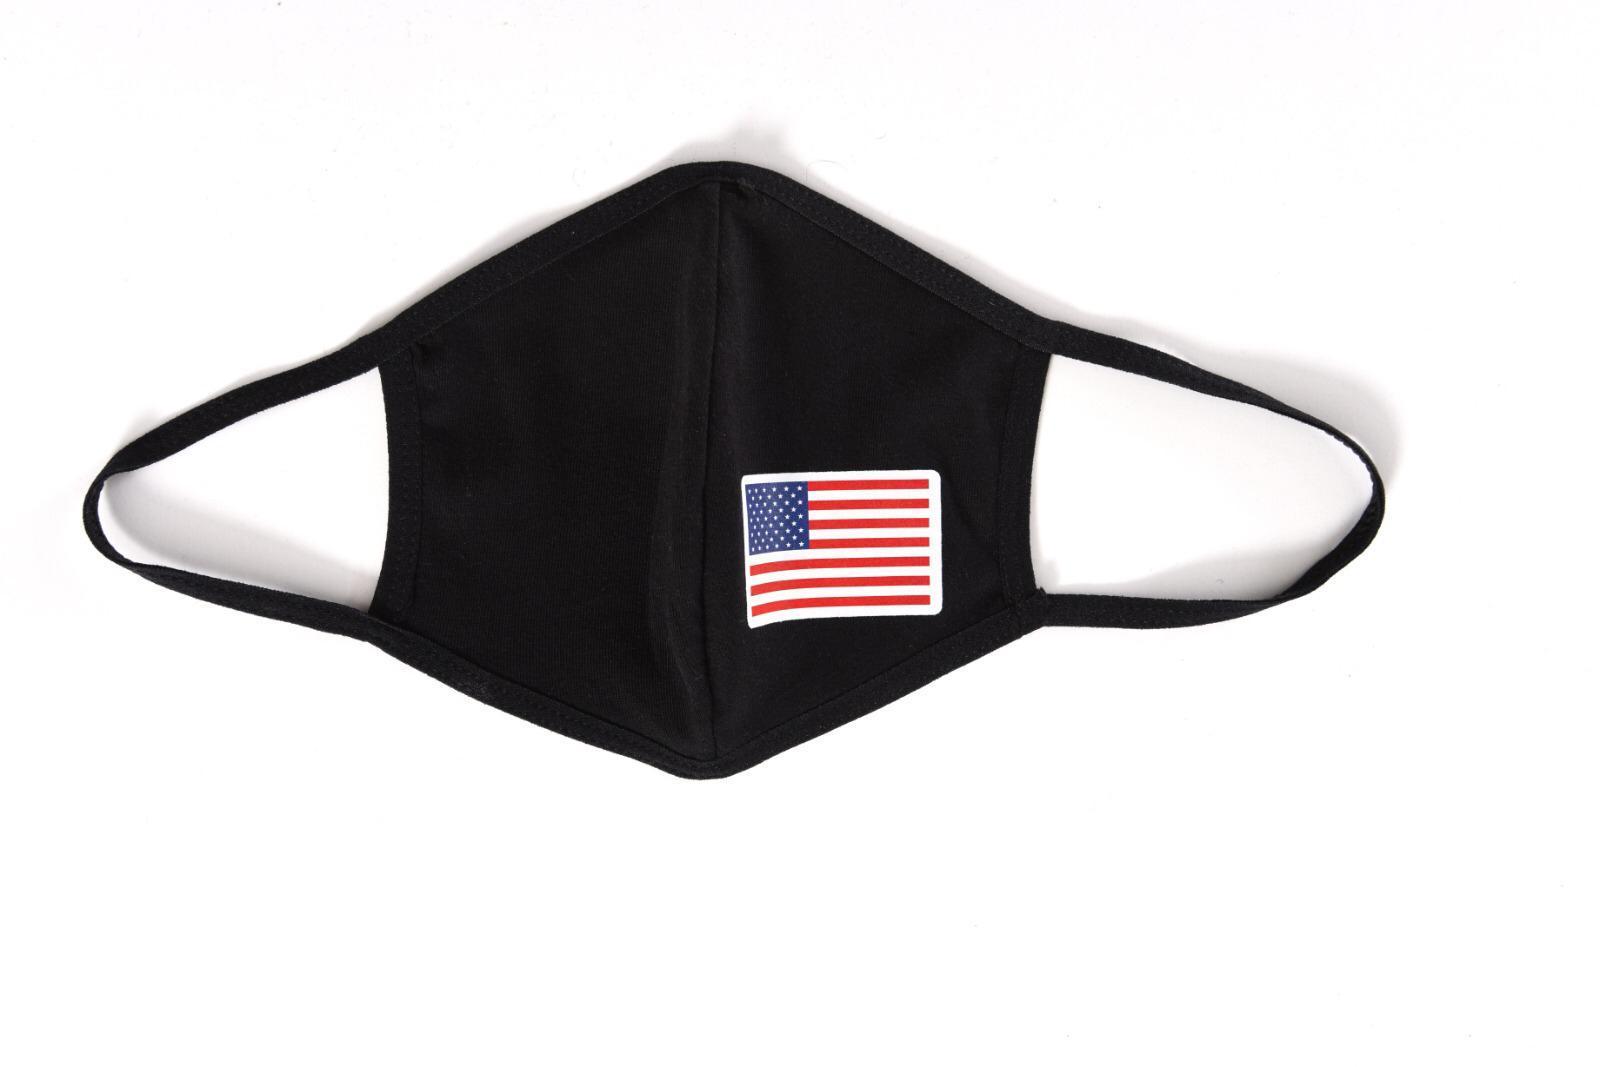 100% Cotton Reusable Face Masks